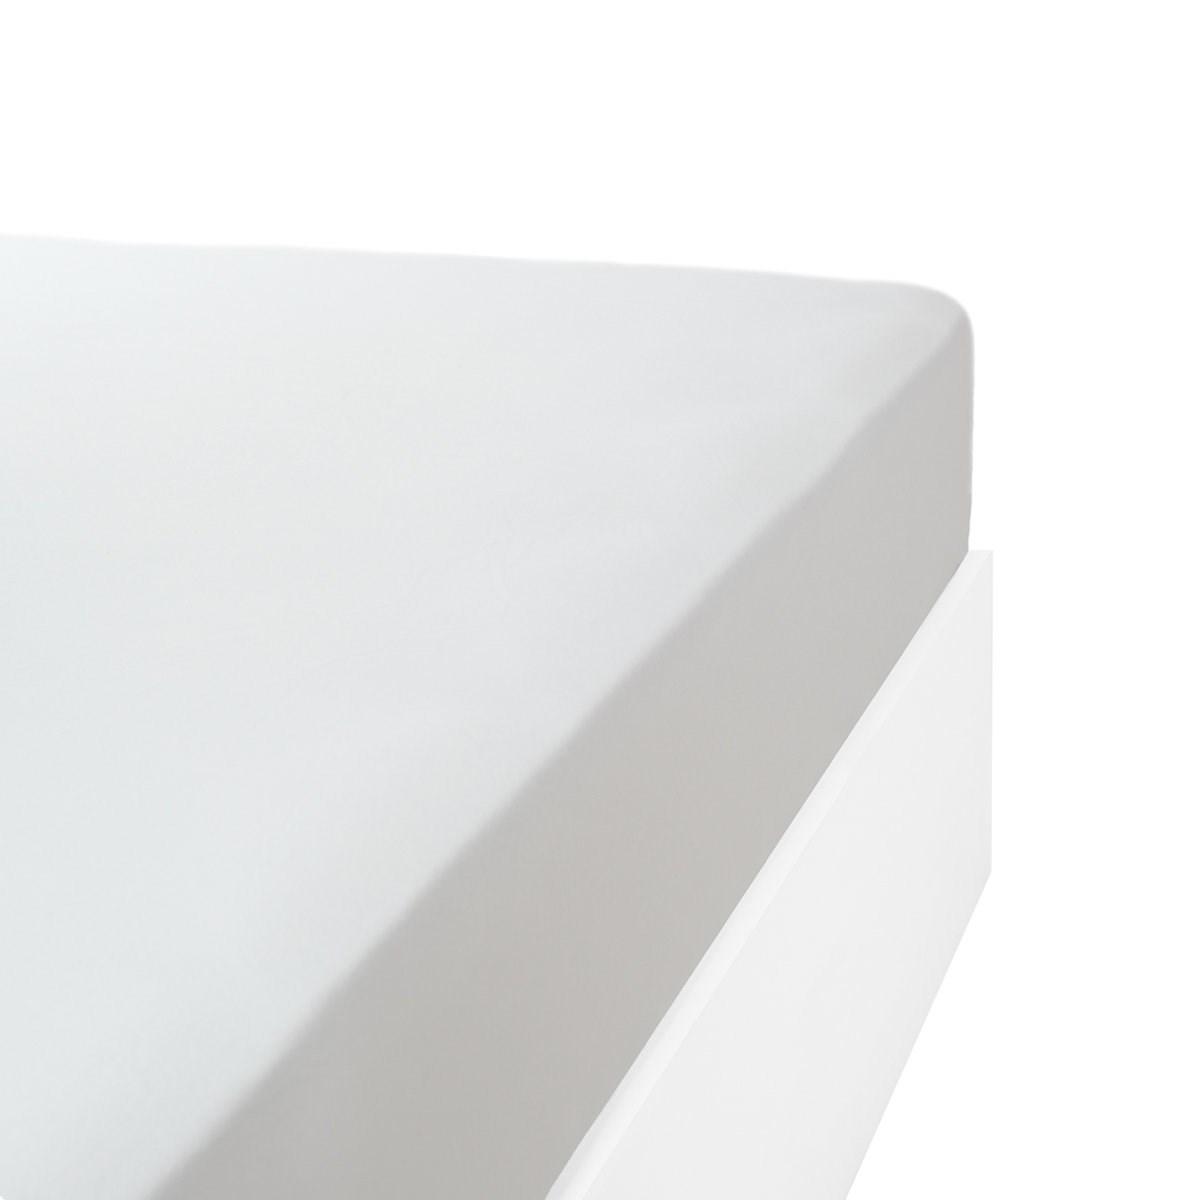 Drap housse jersey extensible en coton blanc 90x200 cm